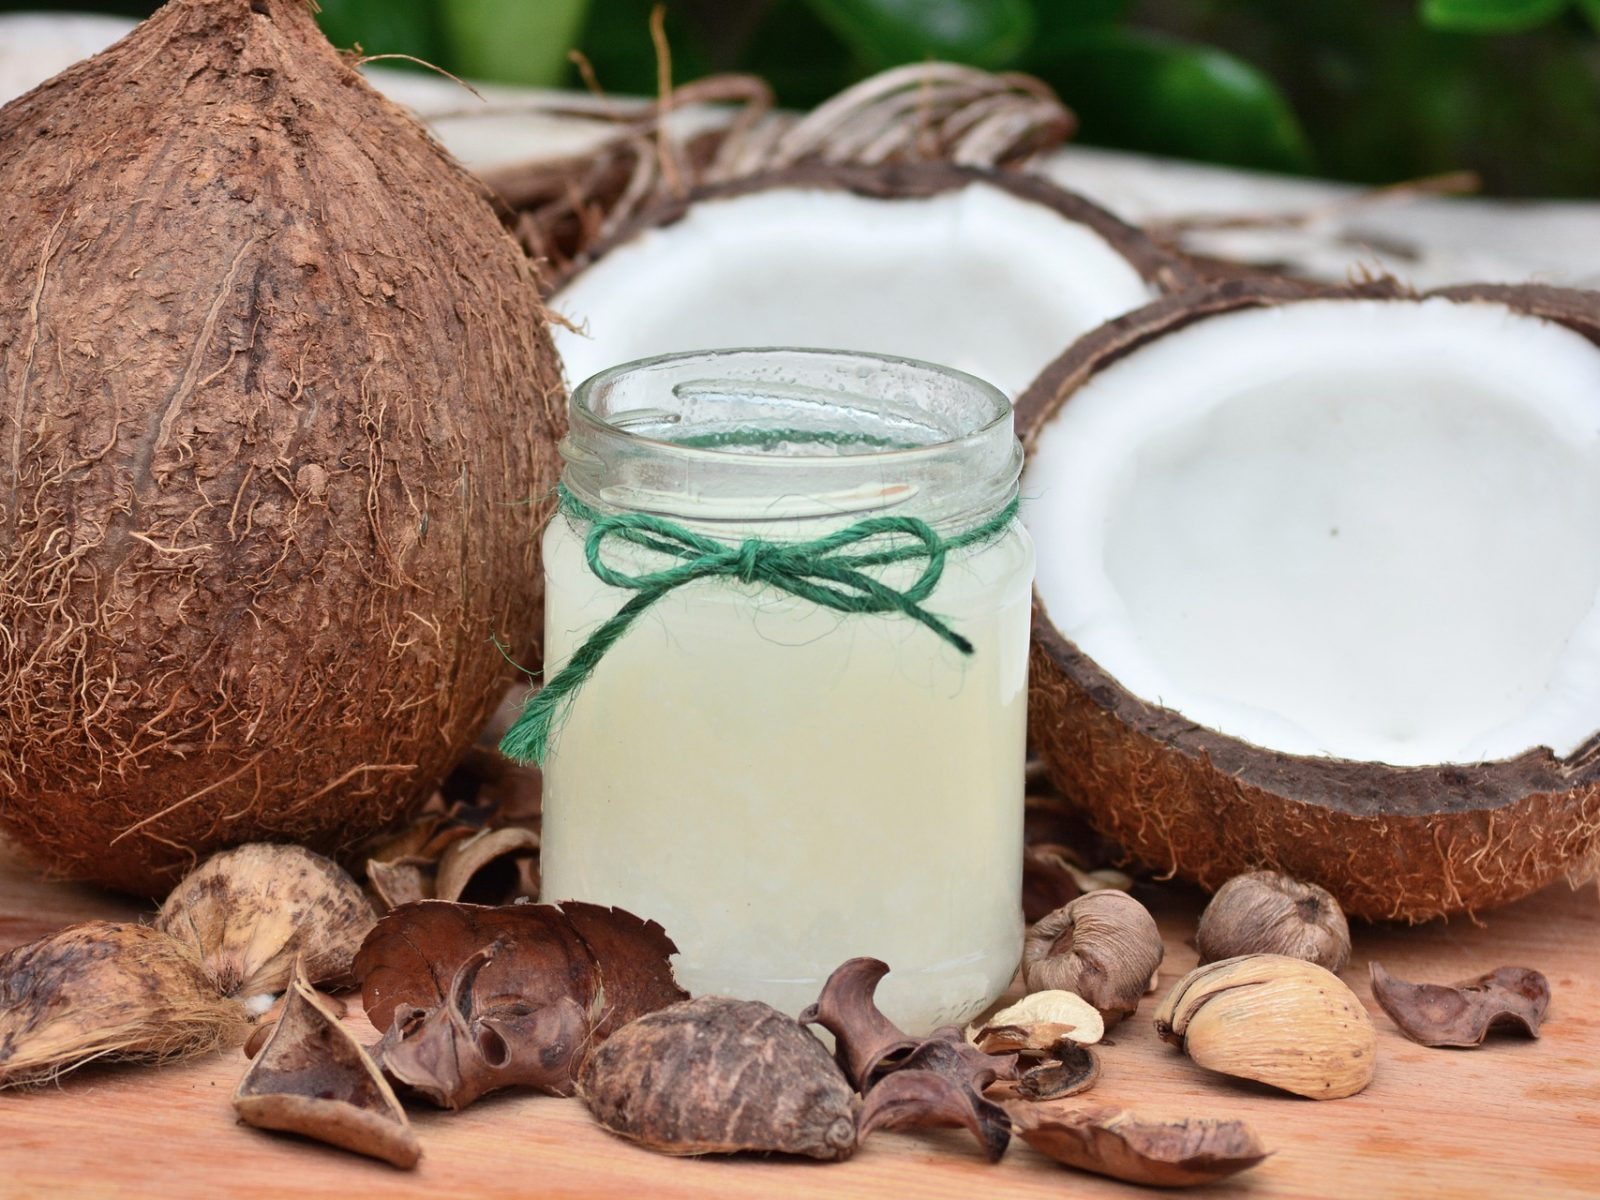 Kokosöl Superfood fürs Gehirn